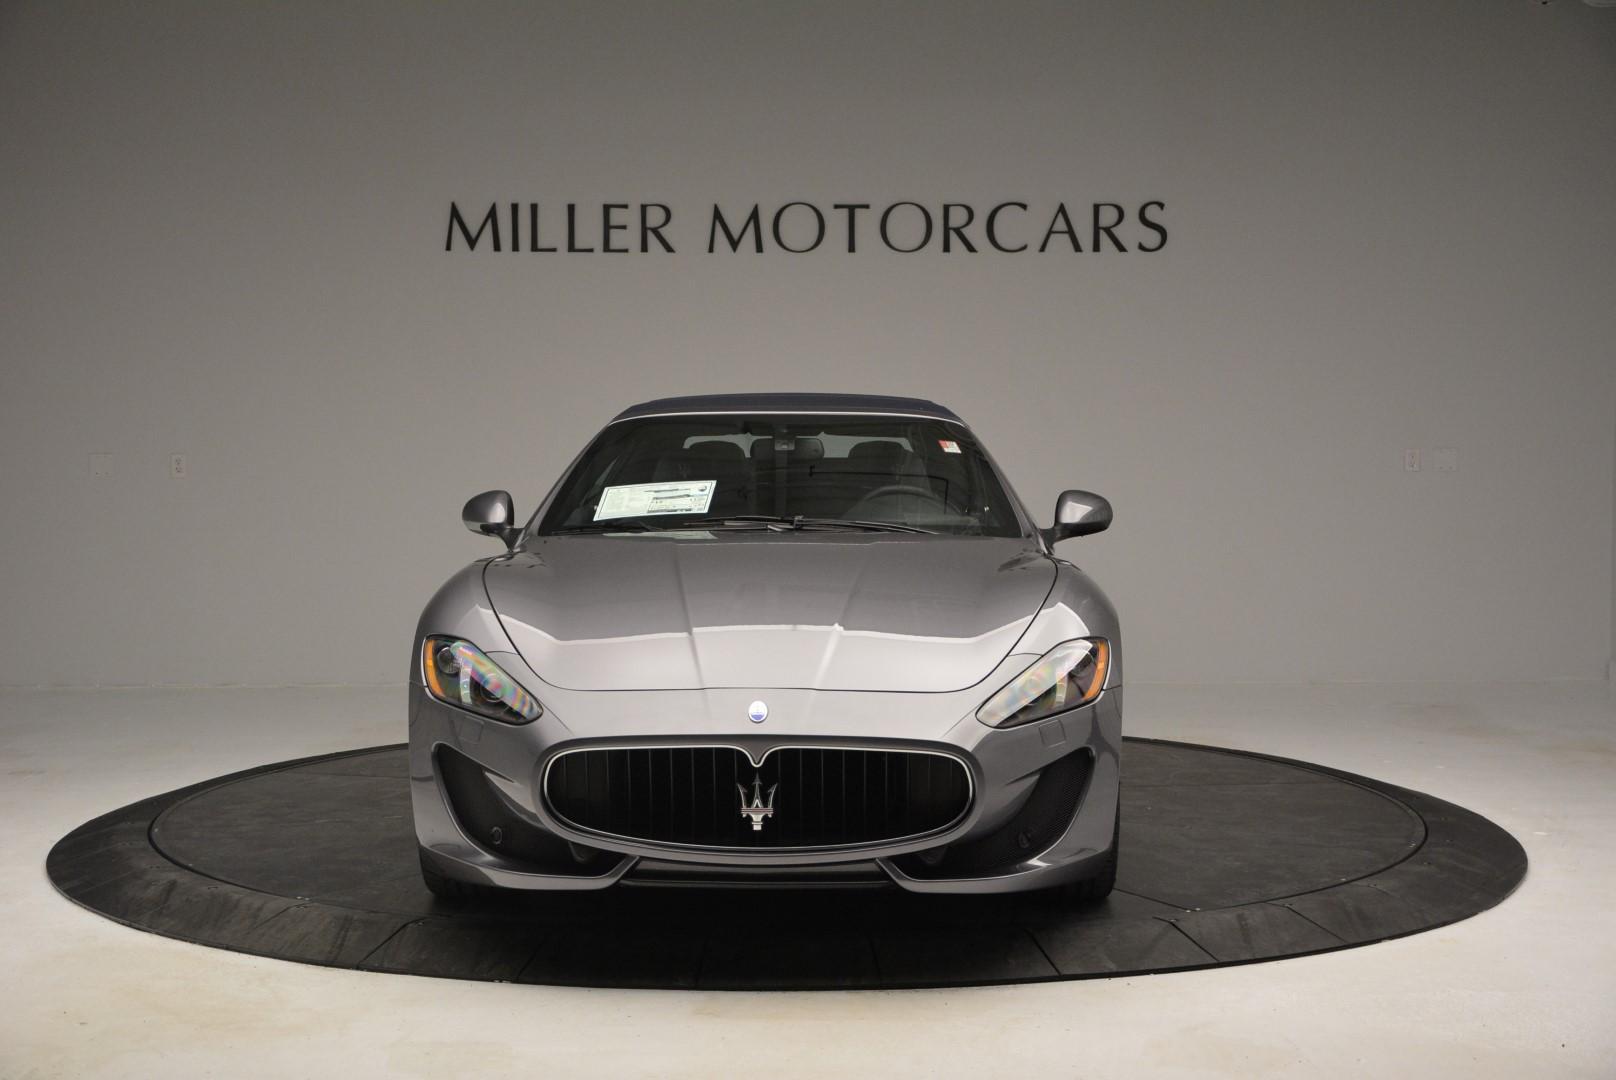 New 2016 Maserati GranTurismo Convertible Sport For Sale In Westport, CT 154_p17